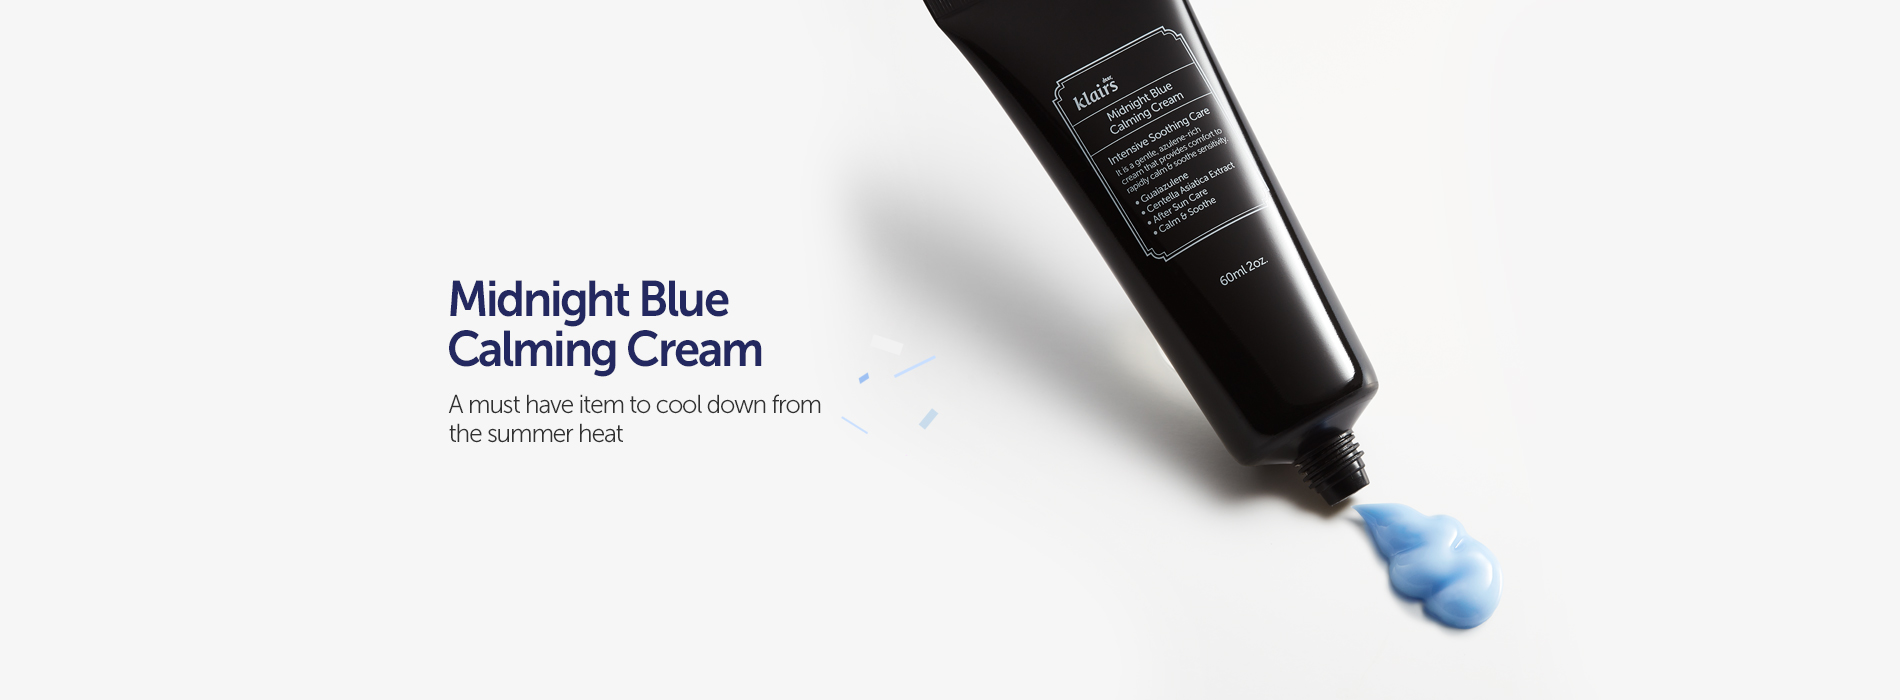 Klairs Midnight Blue Calming Cream 60 ml